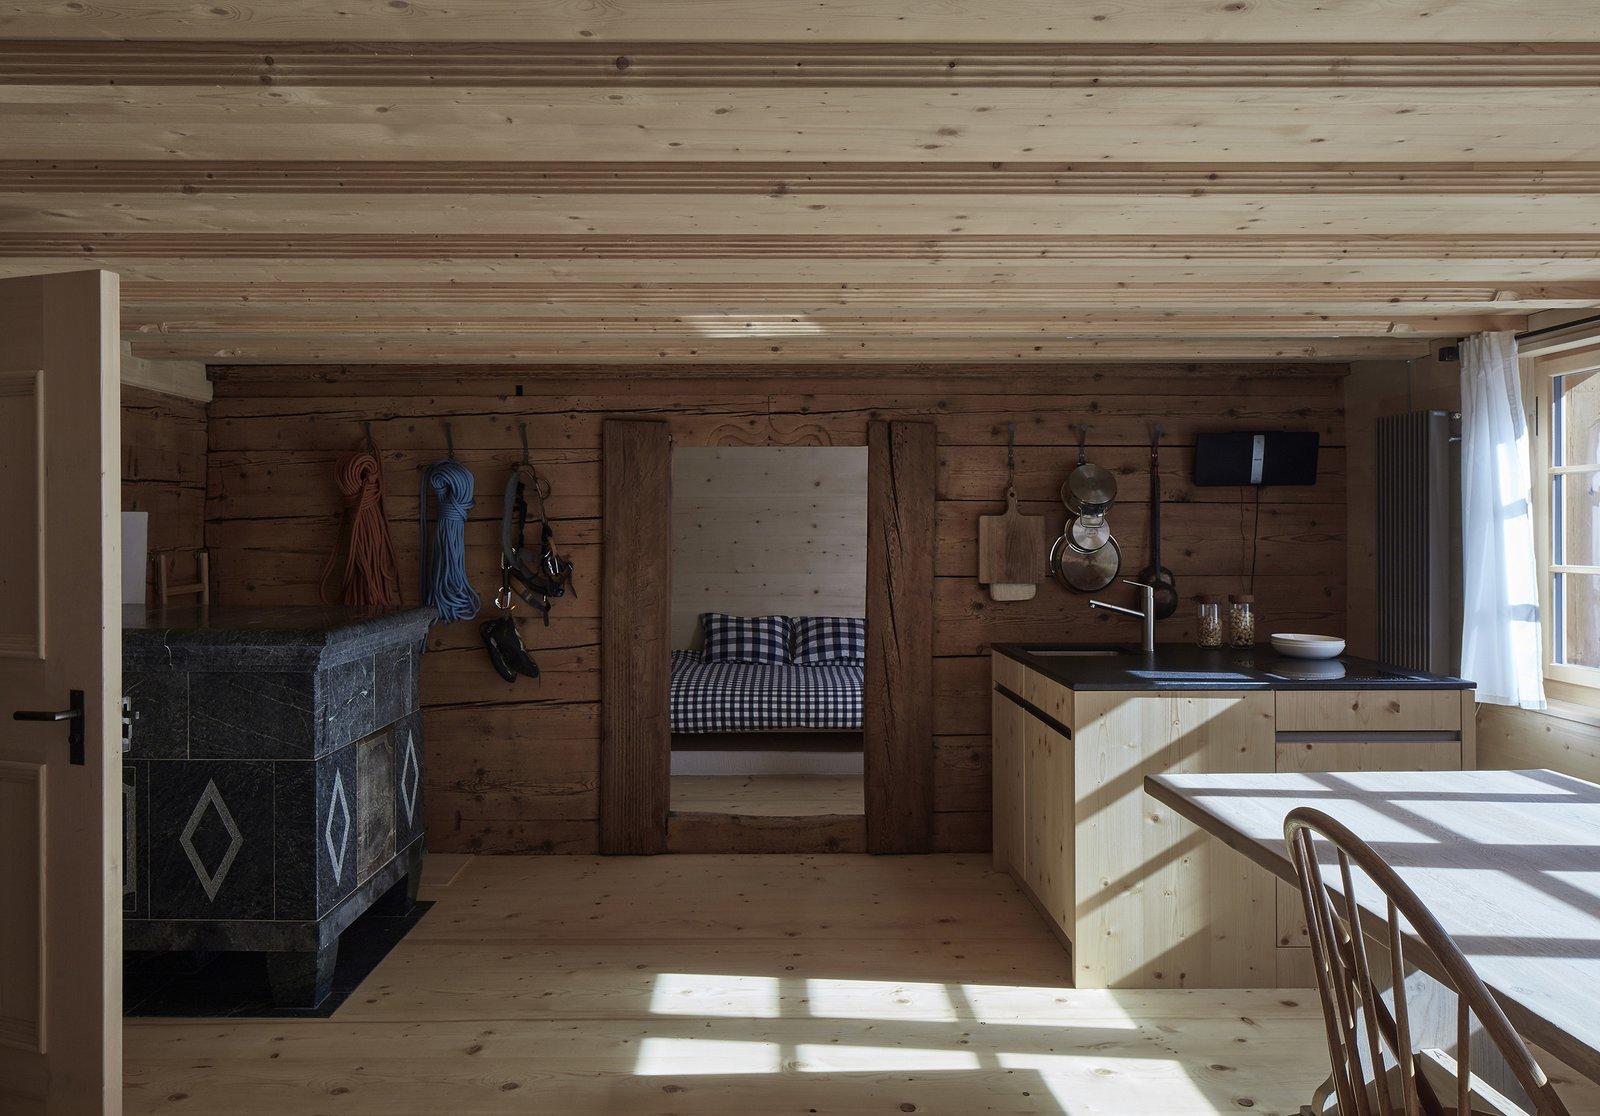 Nossenhaus-Jonathan Tuckey Design